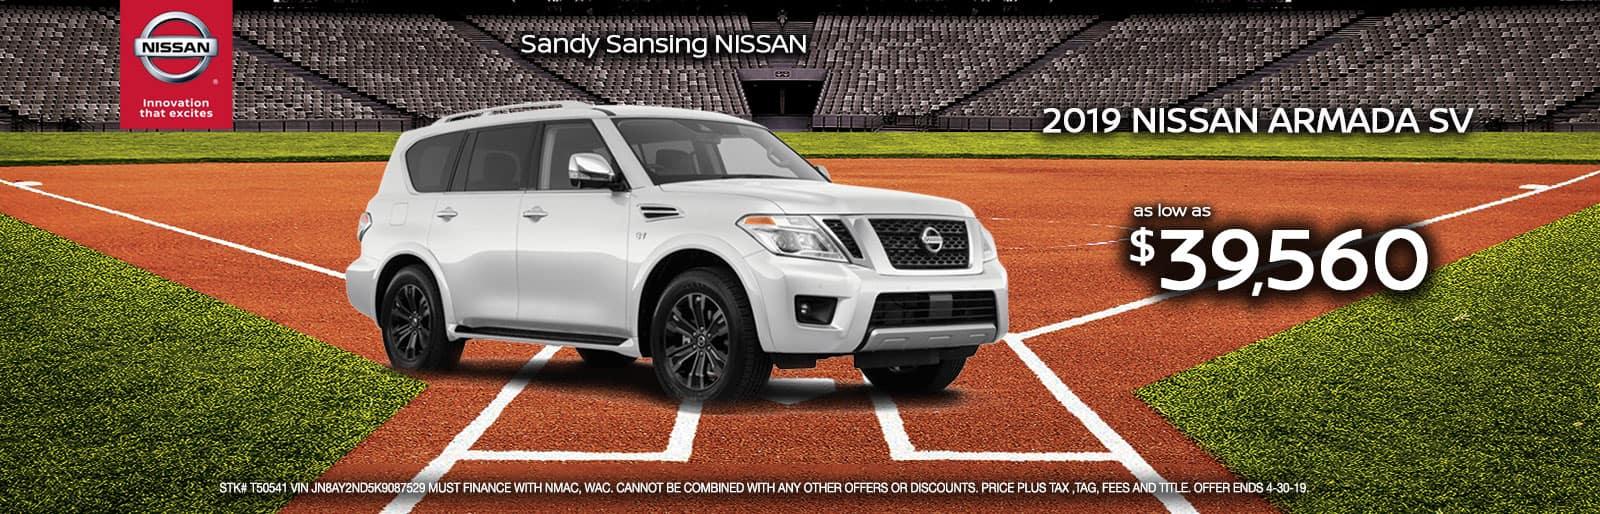 Sandy Sansing Nissan Pensacola FL Armada